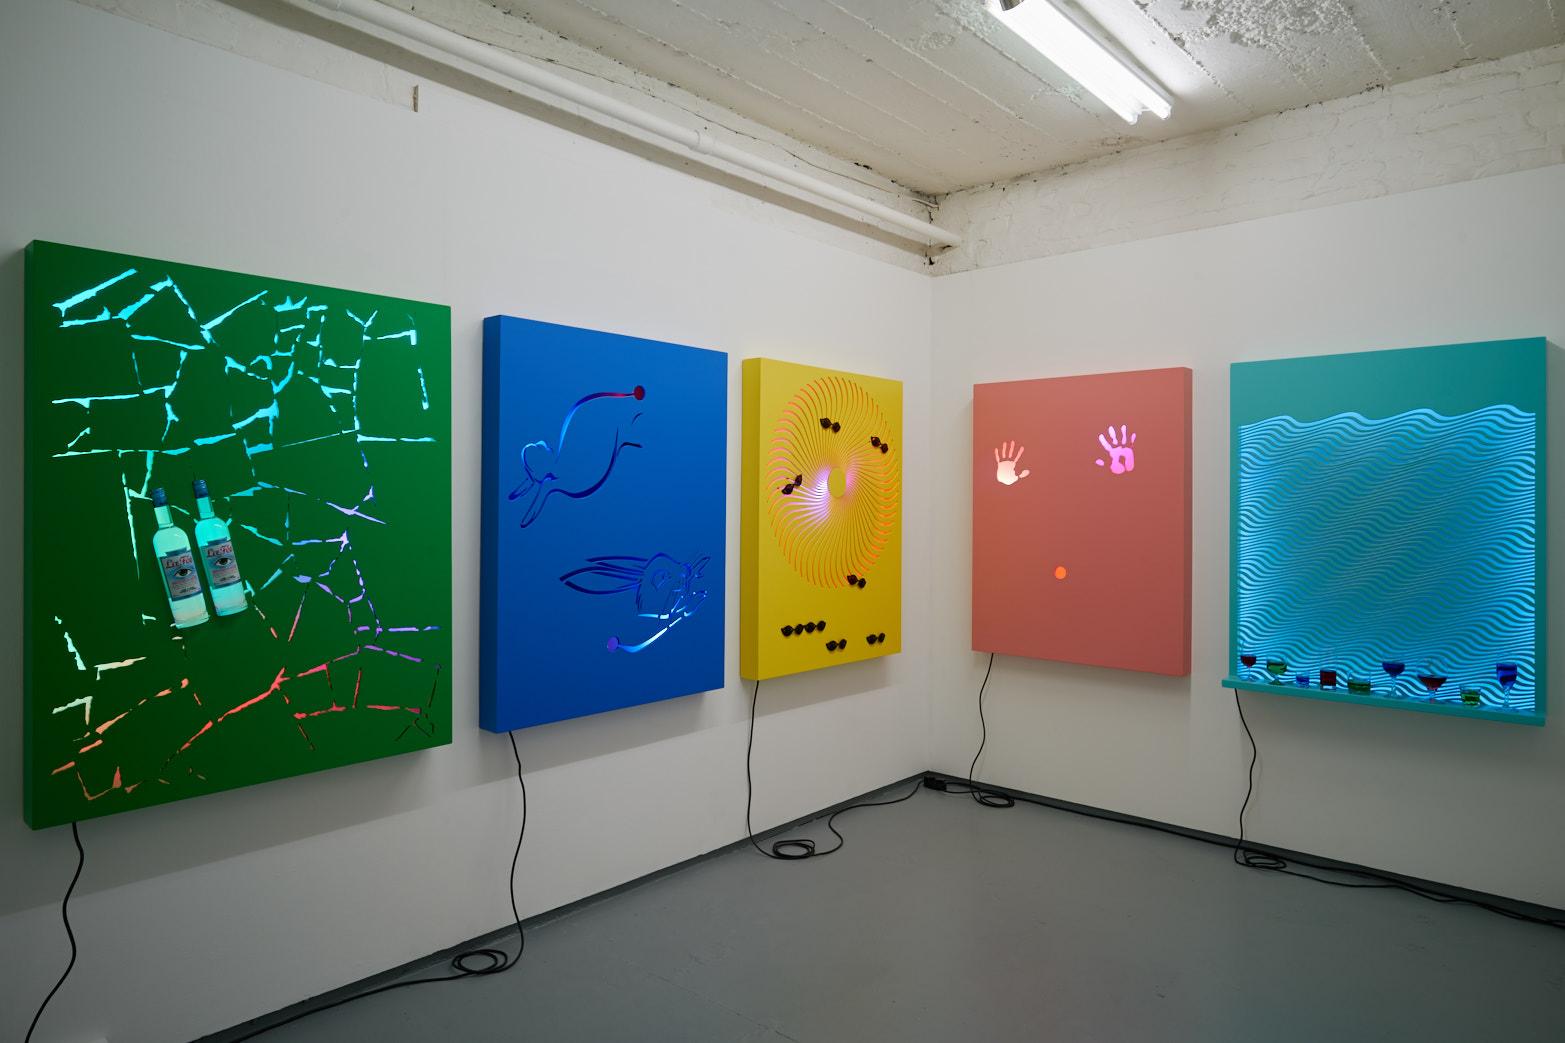 Vortex (2015) - David Ferrando Giraut